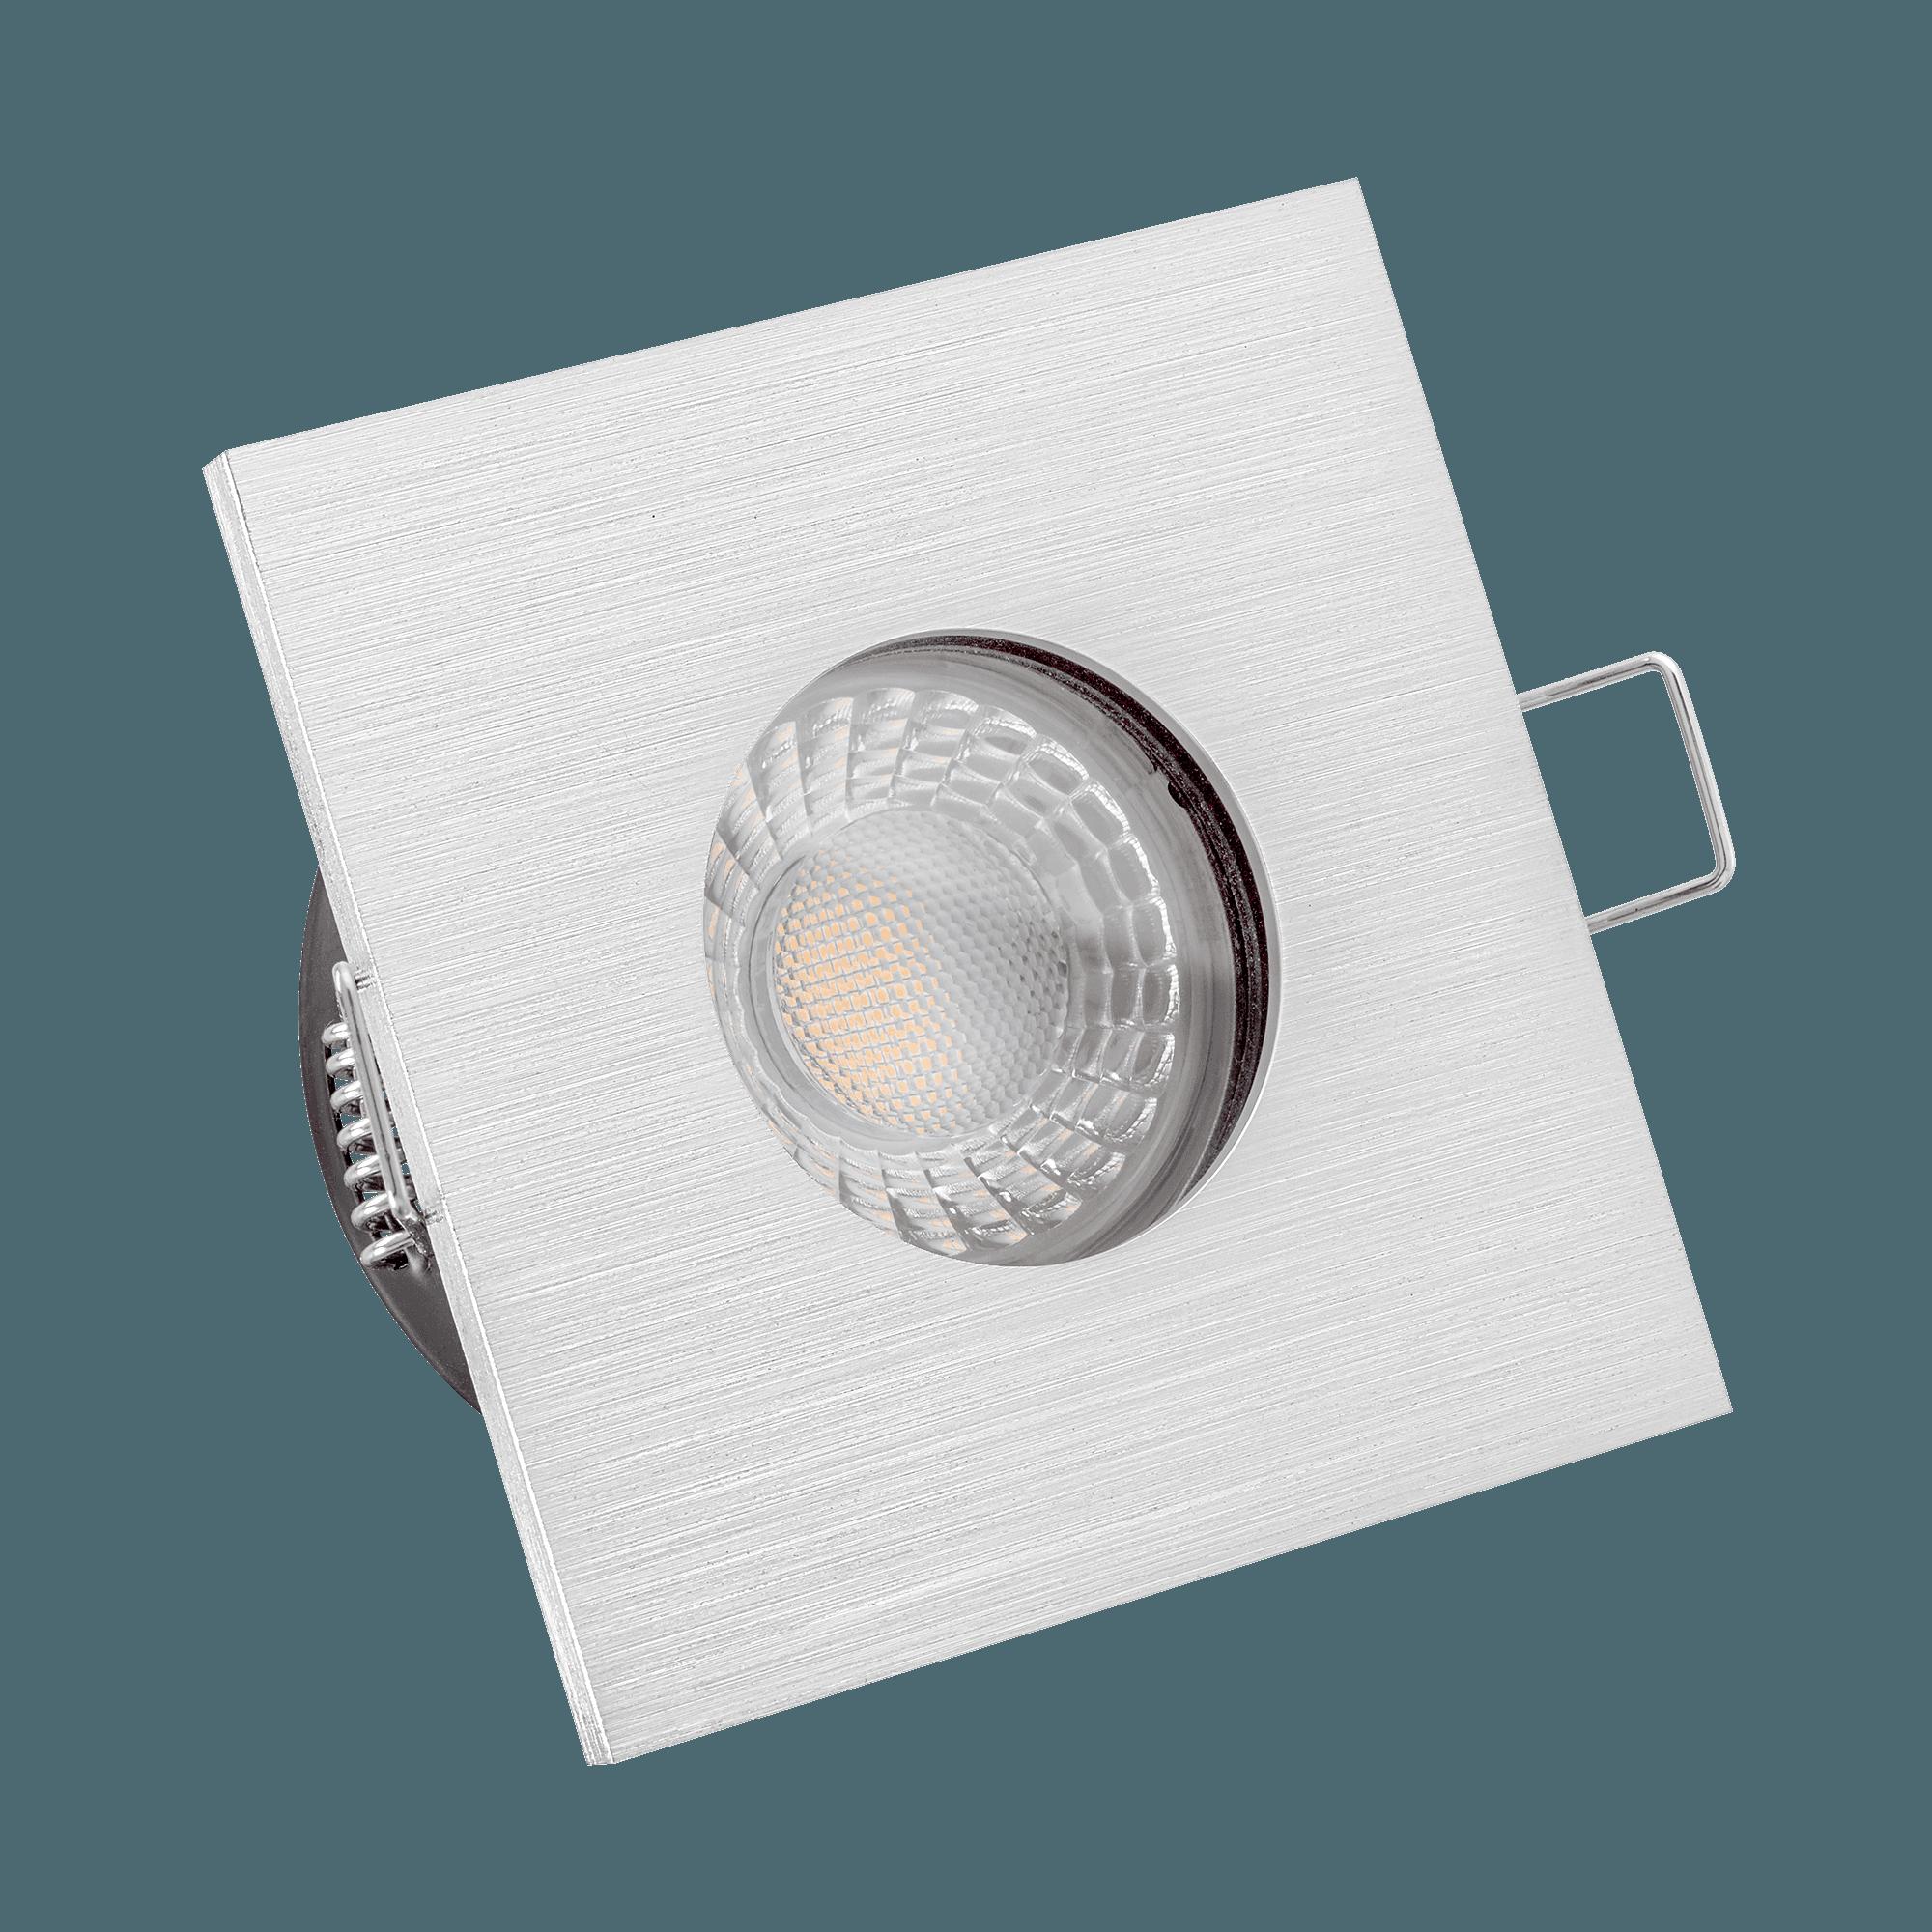 Knx Dali Kompatible Bad Led Einbaustrahler Extra Flach 35mm Dimmbar 6w Statt 70w Lista Aqua Geburstet 60 Aluminium Eckig Ip65